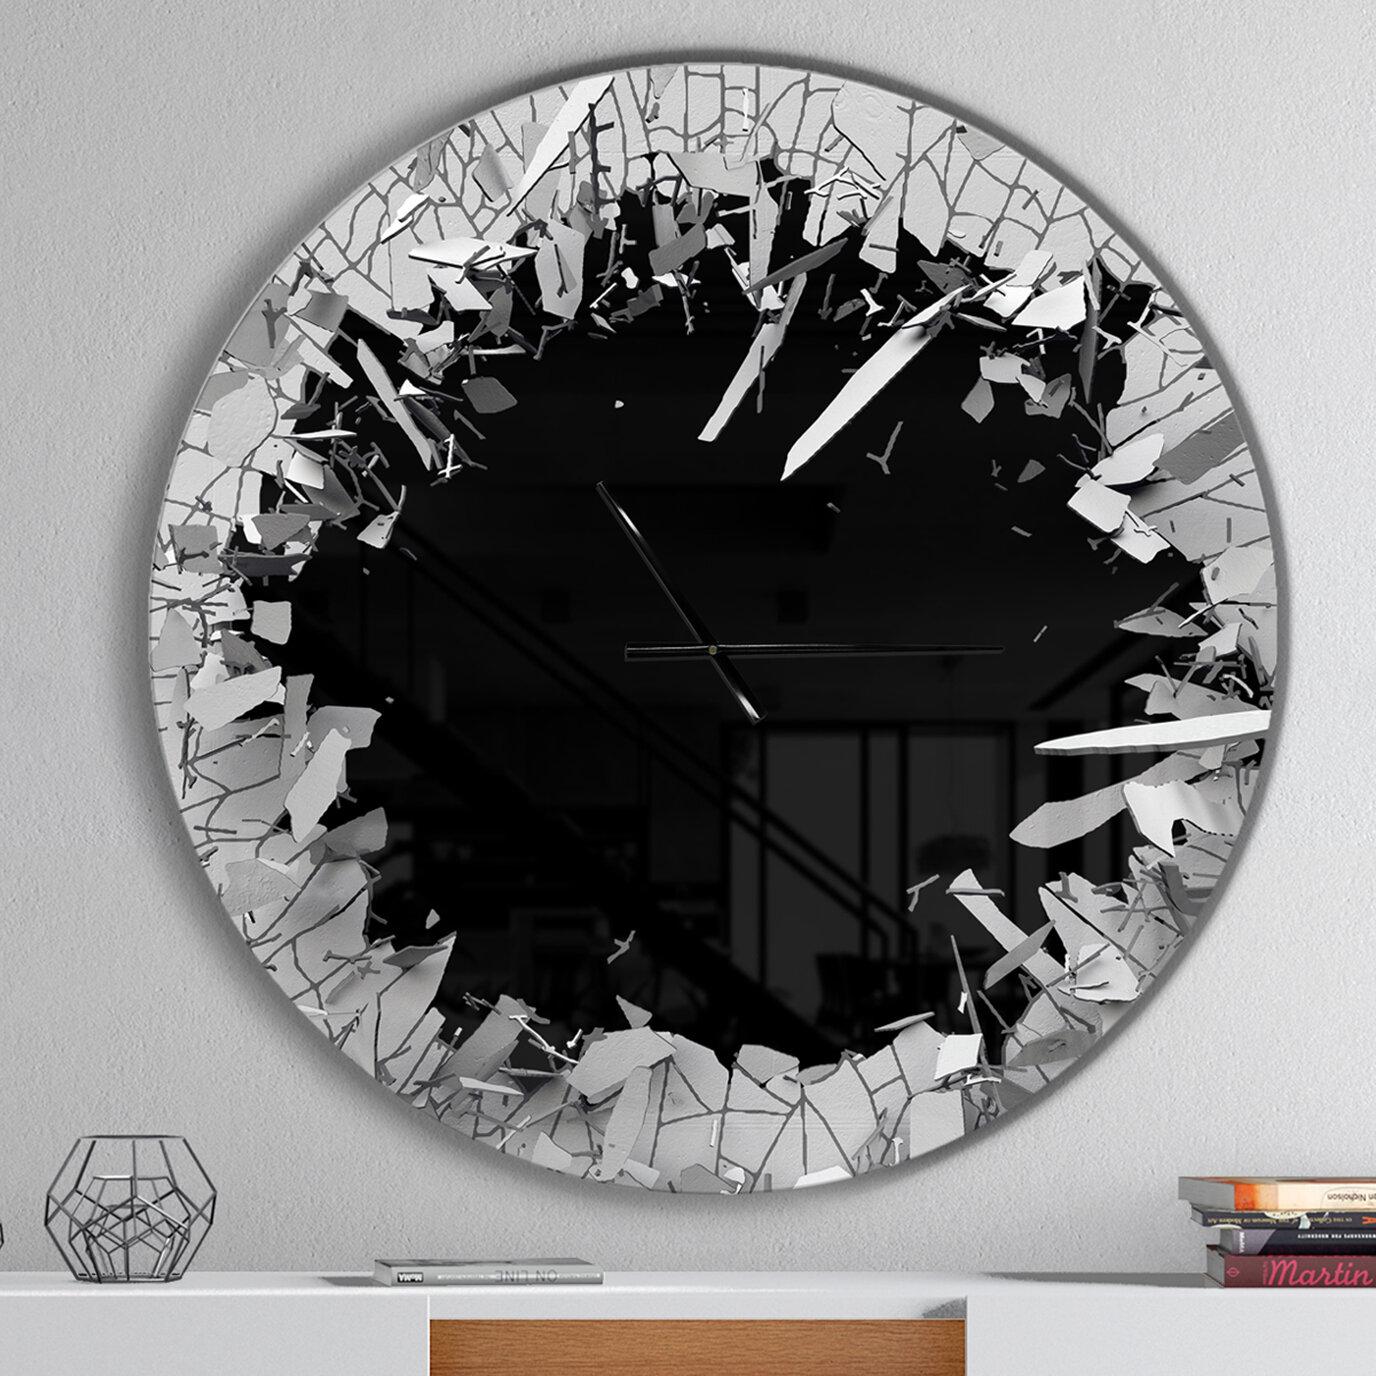 . Broken Wall 3D Design Wall Clock